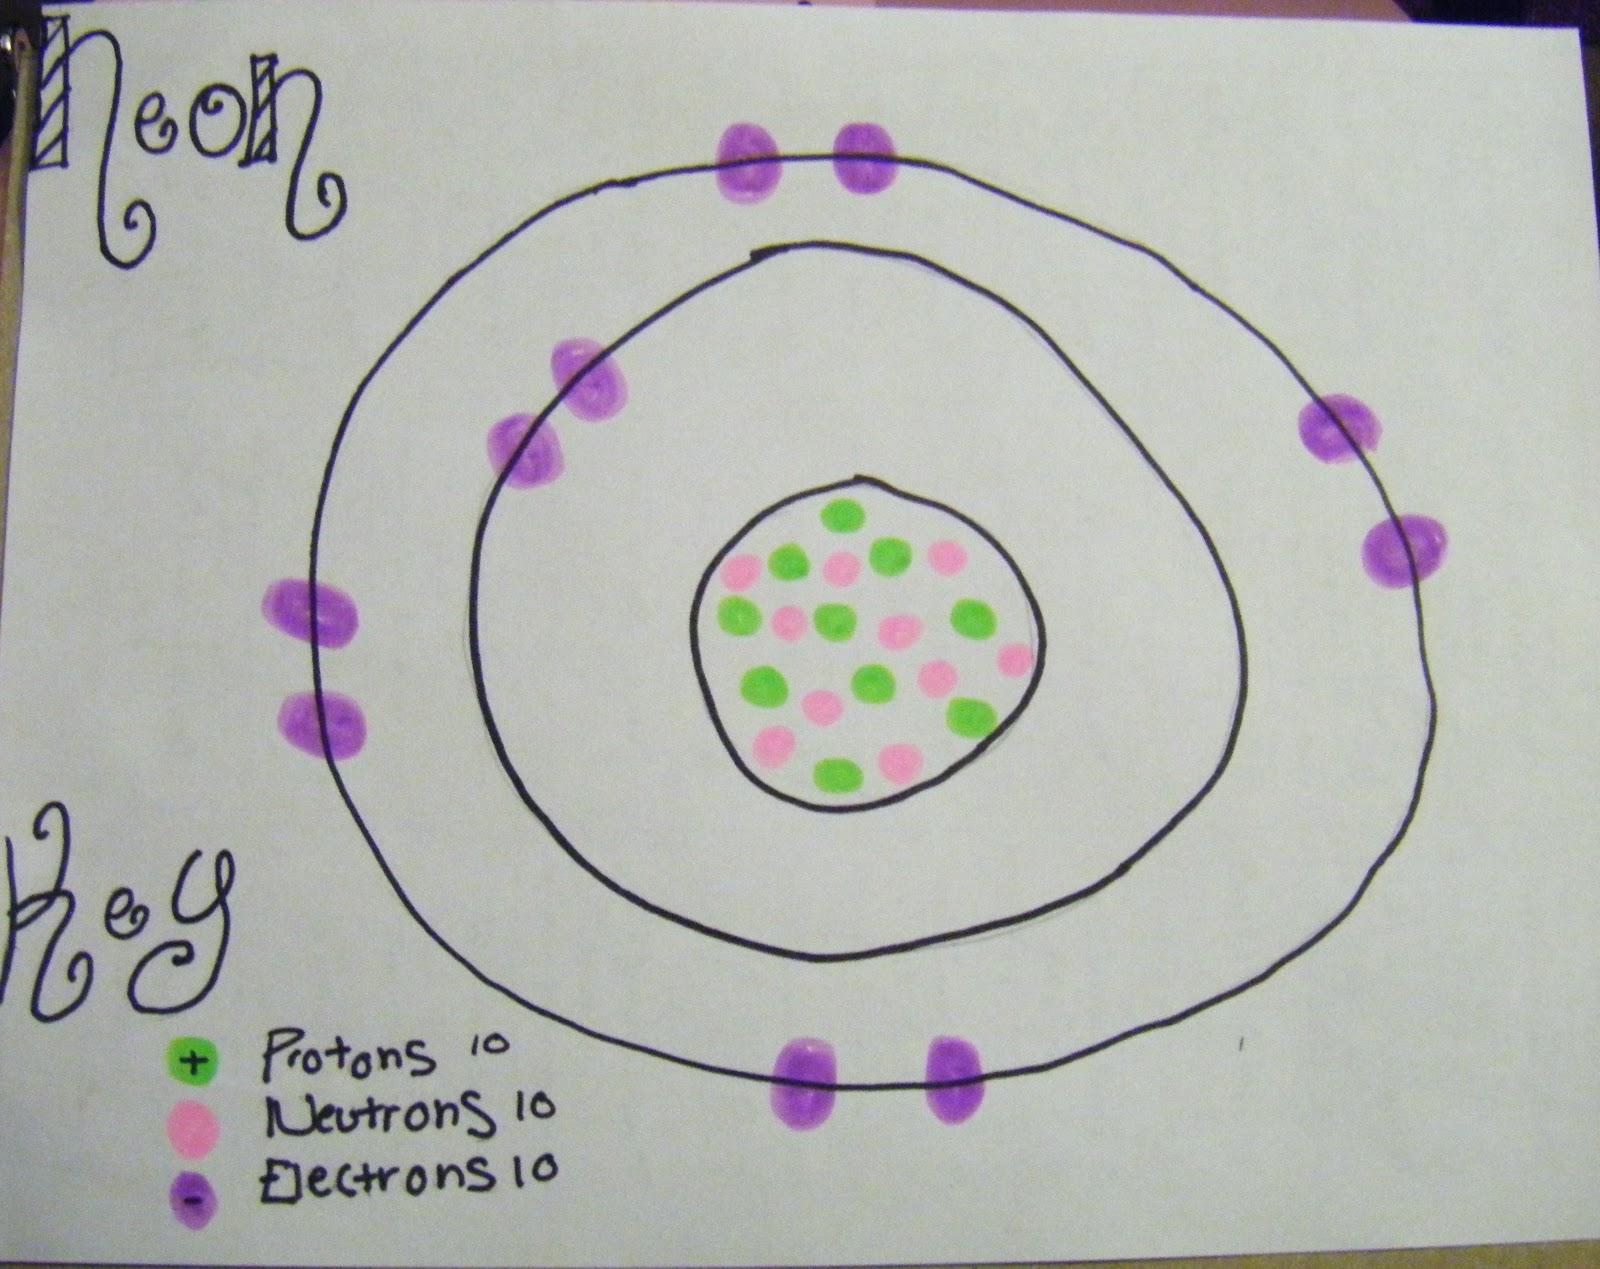 neon atom diagram ceiling fan switch wiring visualizing chem blog homework day 1 10 11